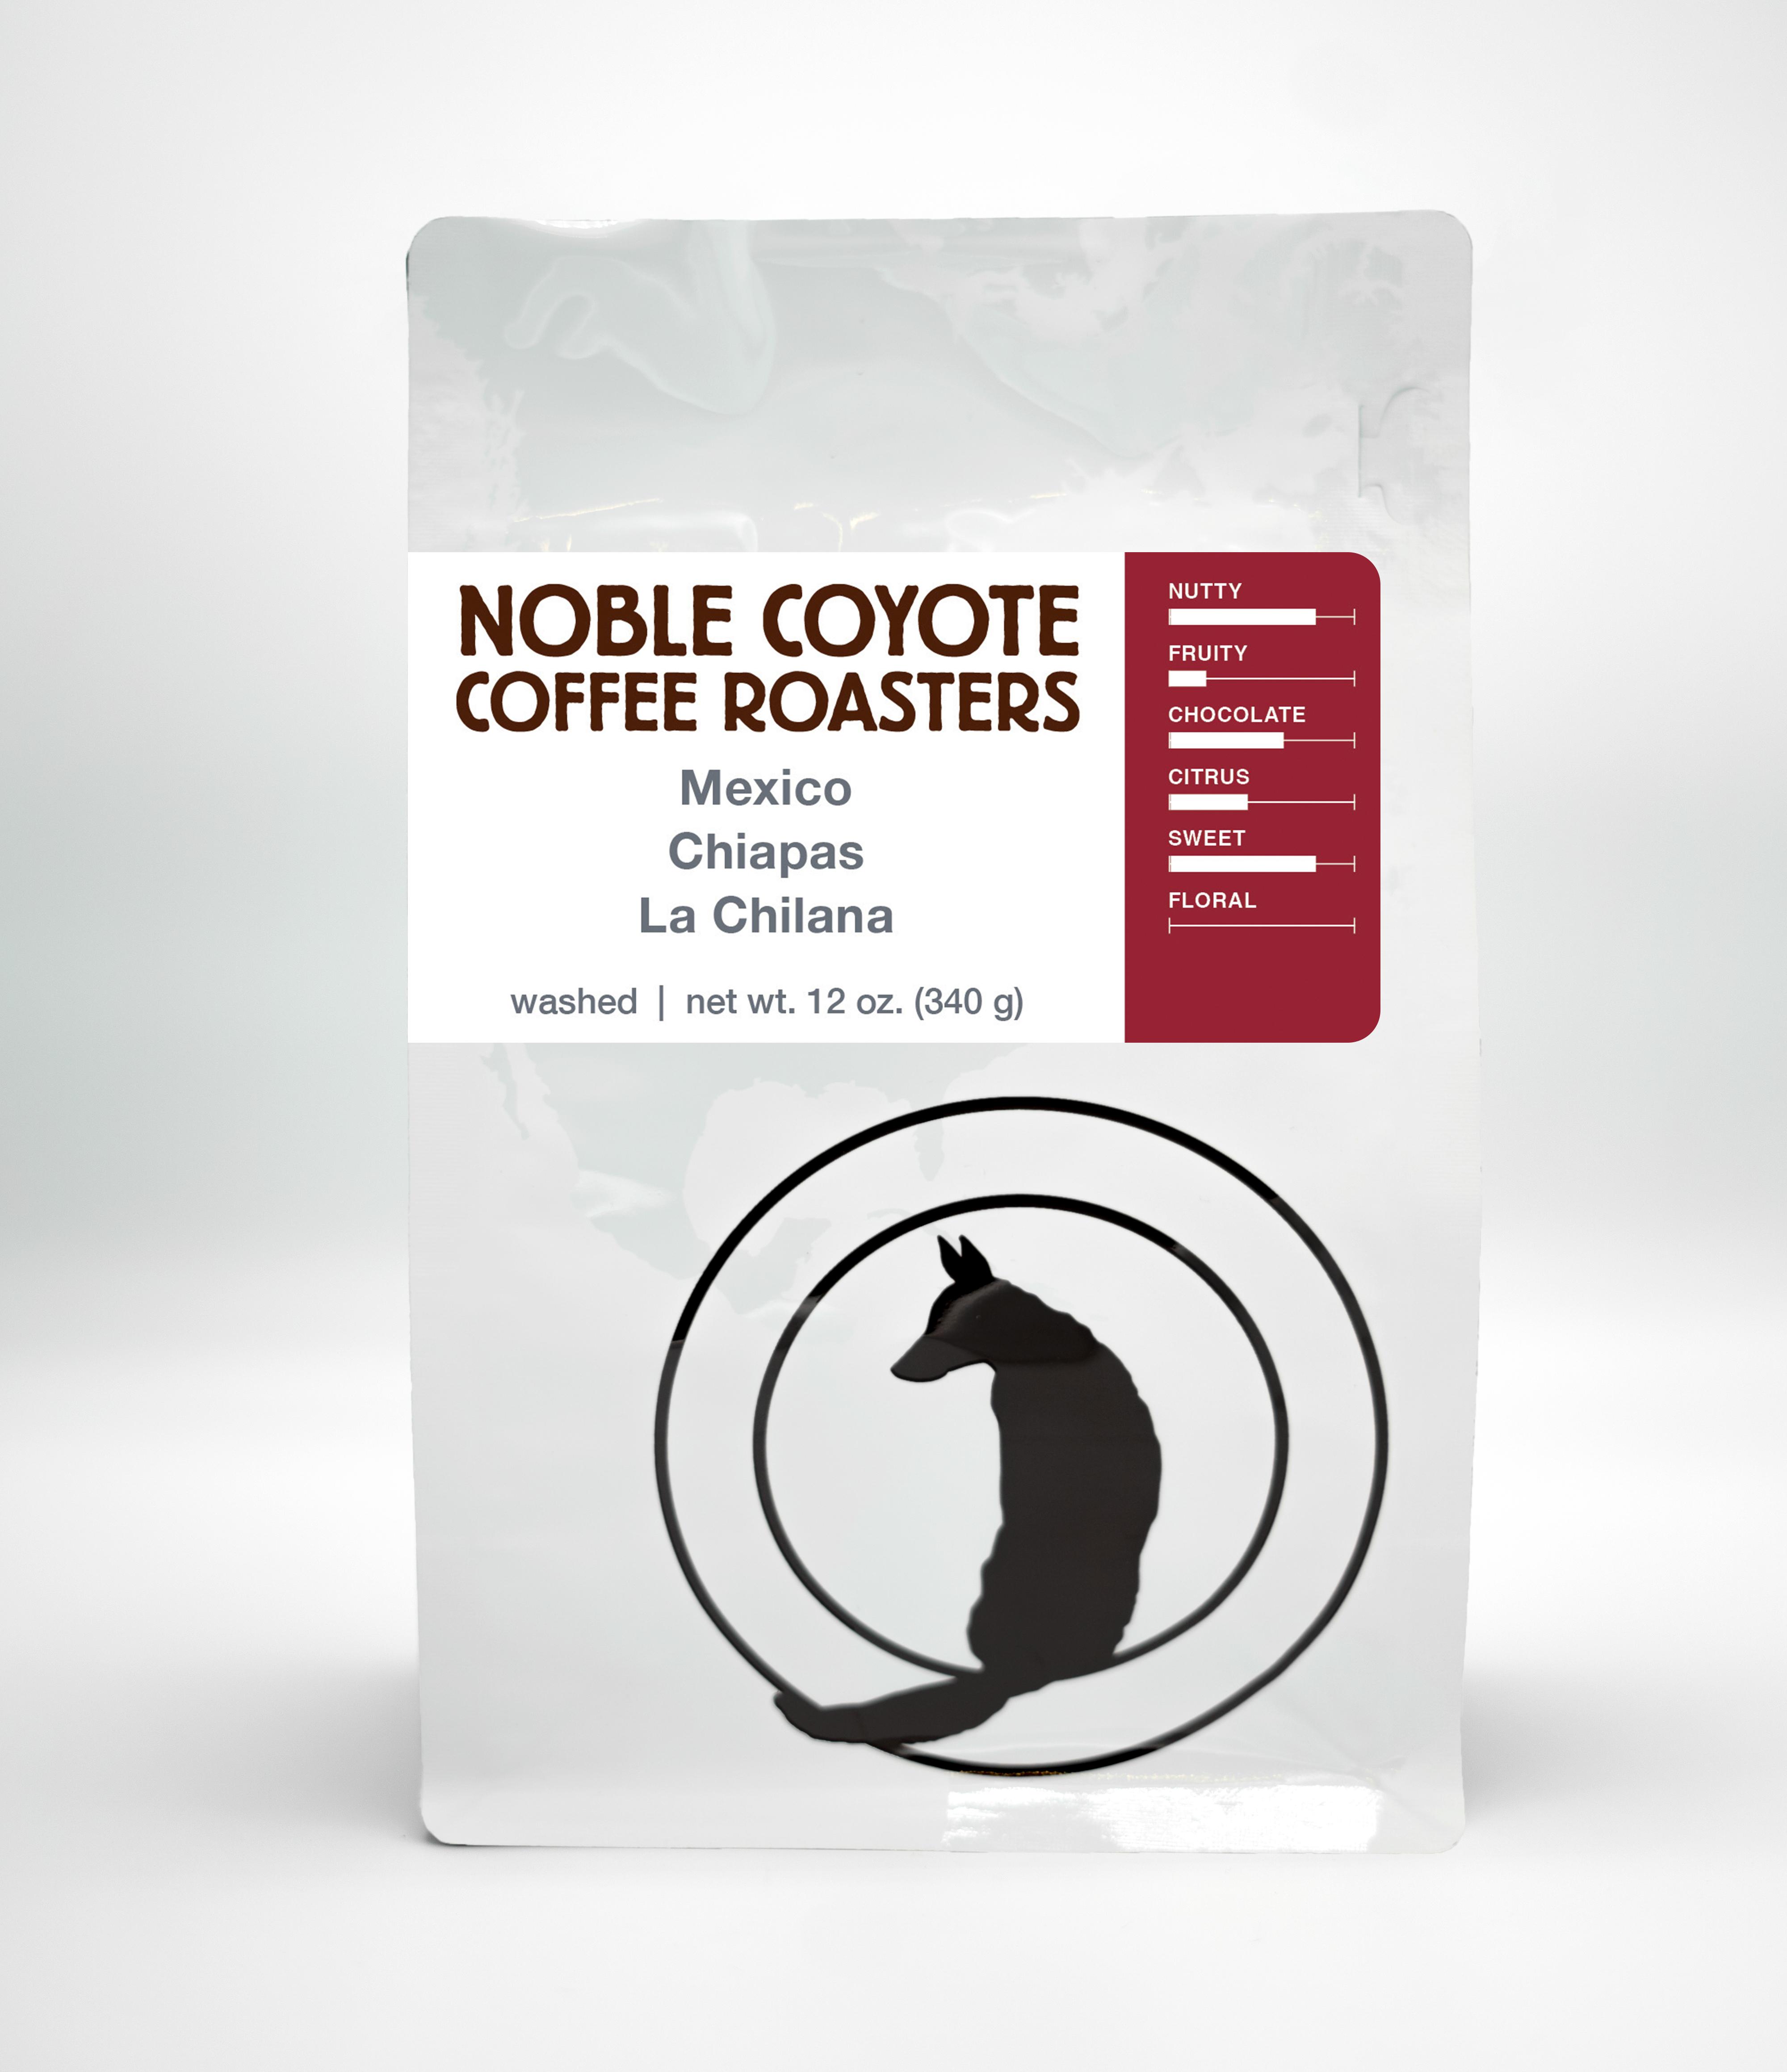 Mexico Chiapas La Chilana from Noble Coyote Coffee Roasters